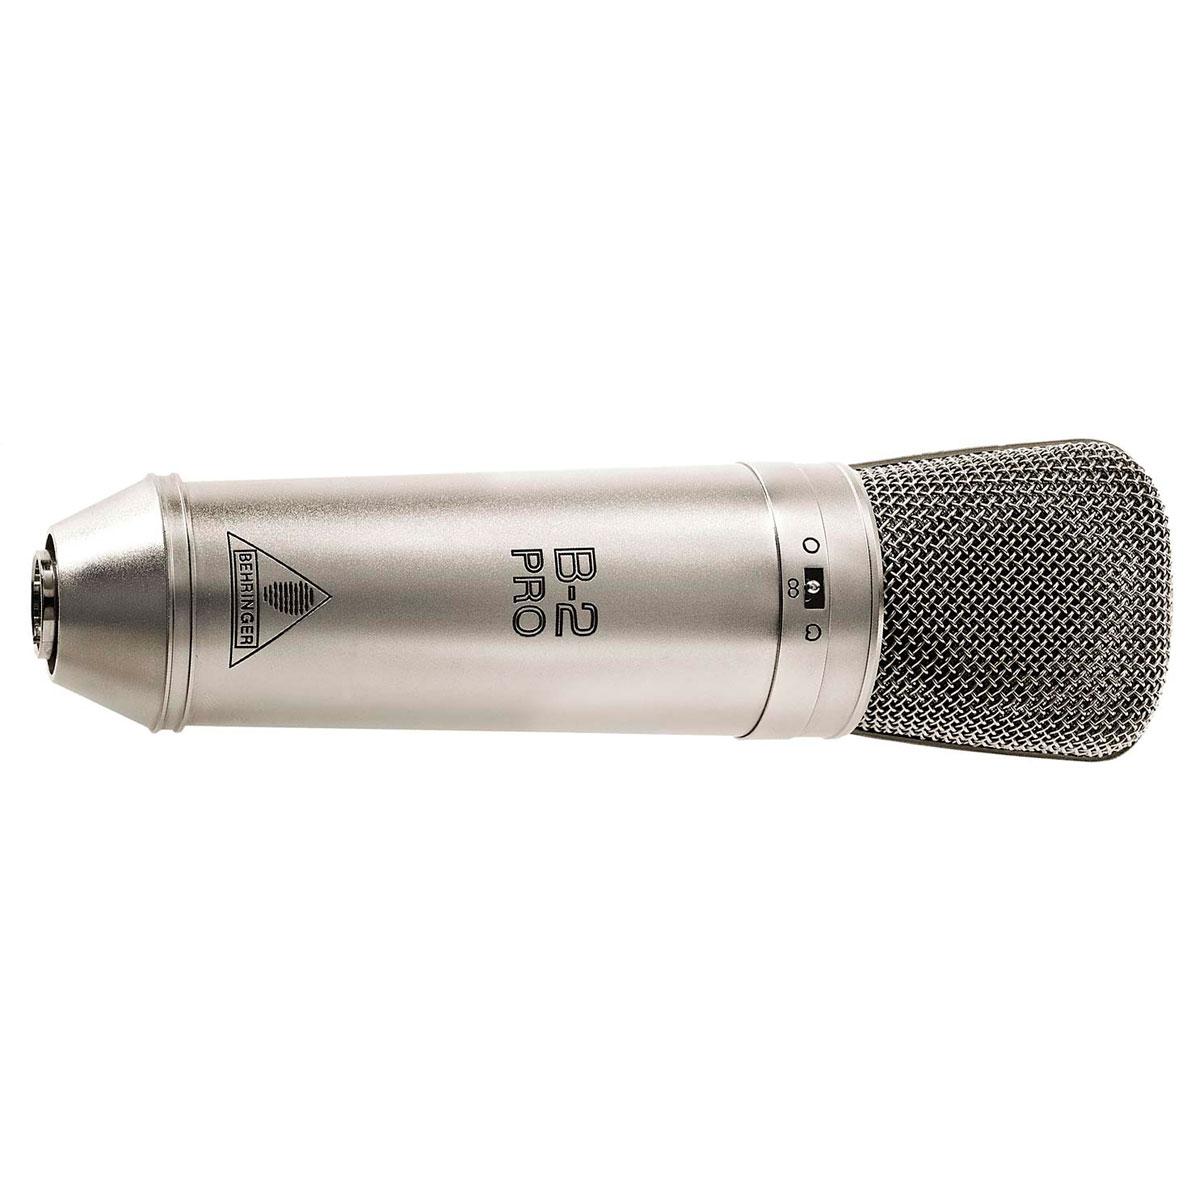 Microfone c/ Fio Condensador - B 2 Pro Behringer